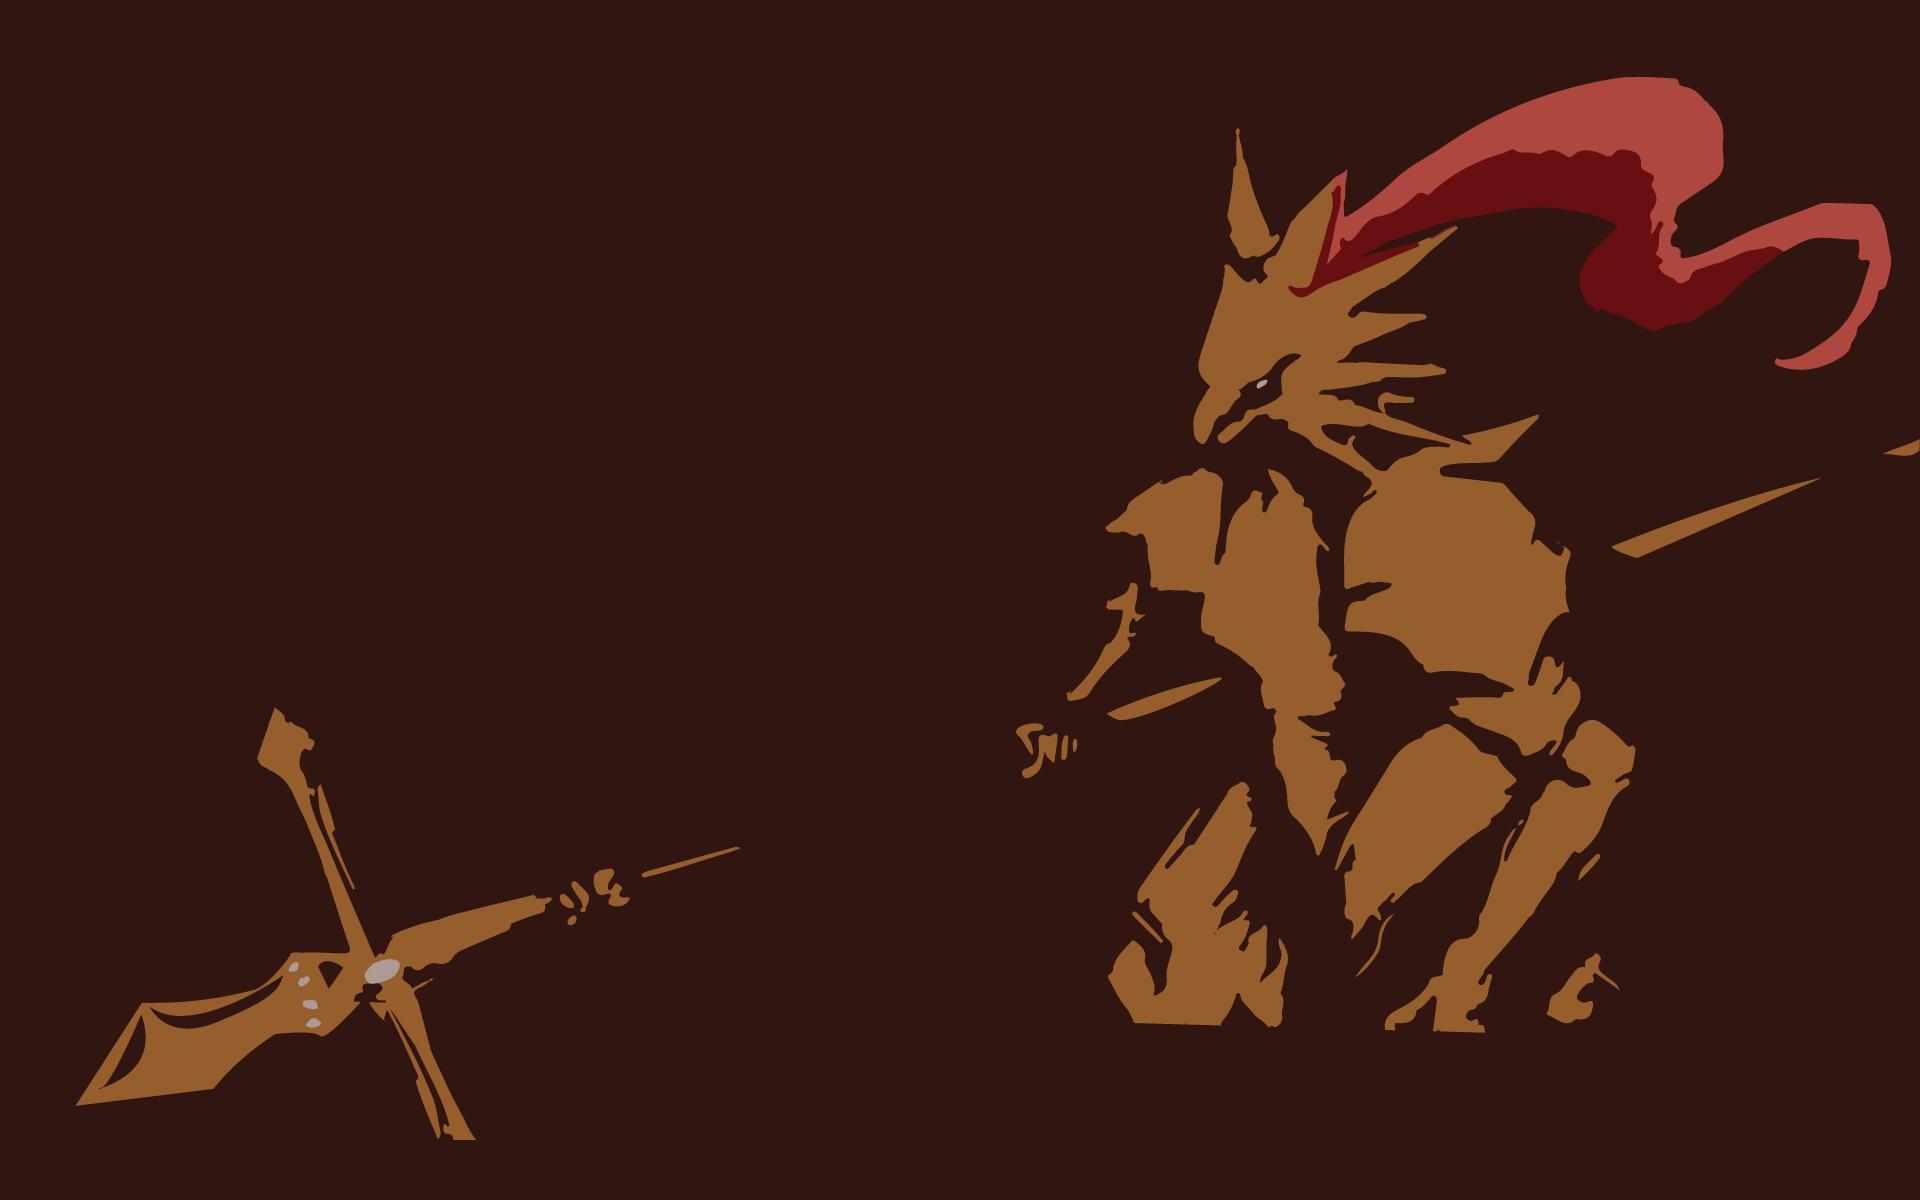 Dark Souls 3 Background Hd Dark Souls Wallpaper Dark Souls Solaire Dark Souls